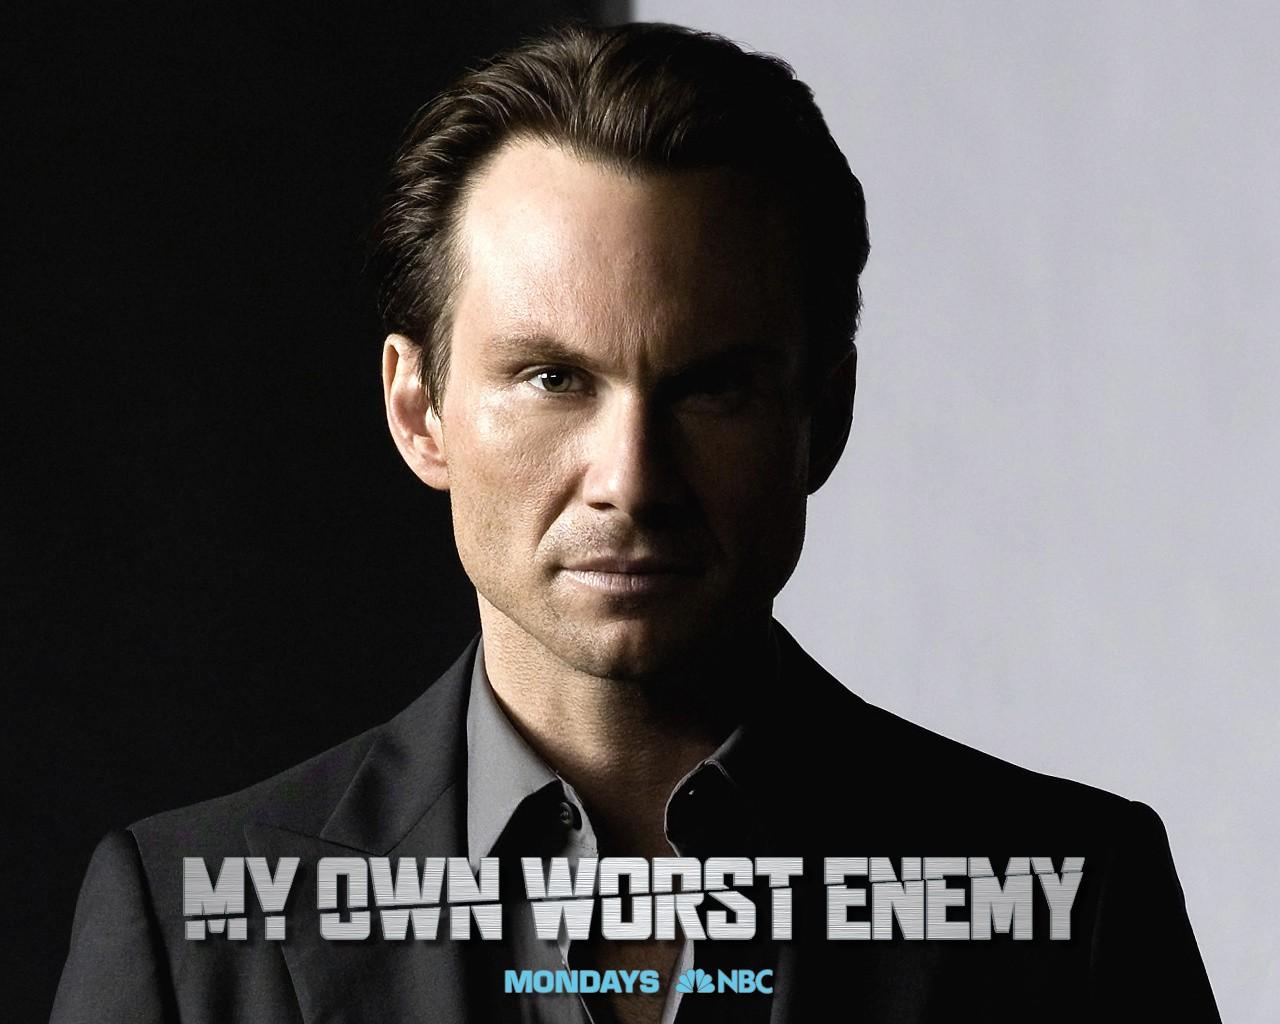 Wallpaper della serie My Own Worst Enemy